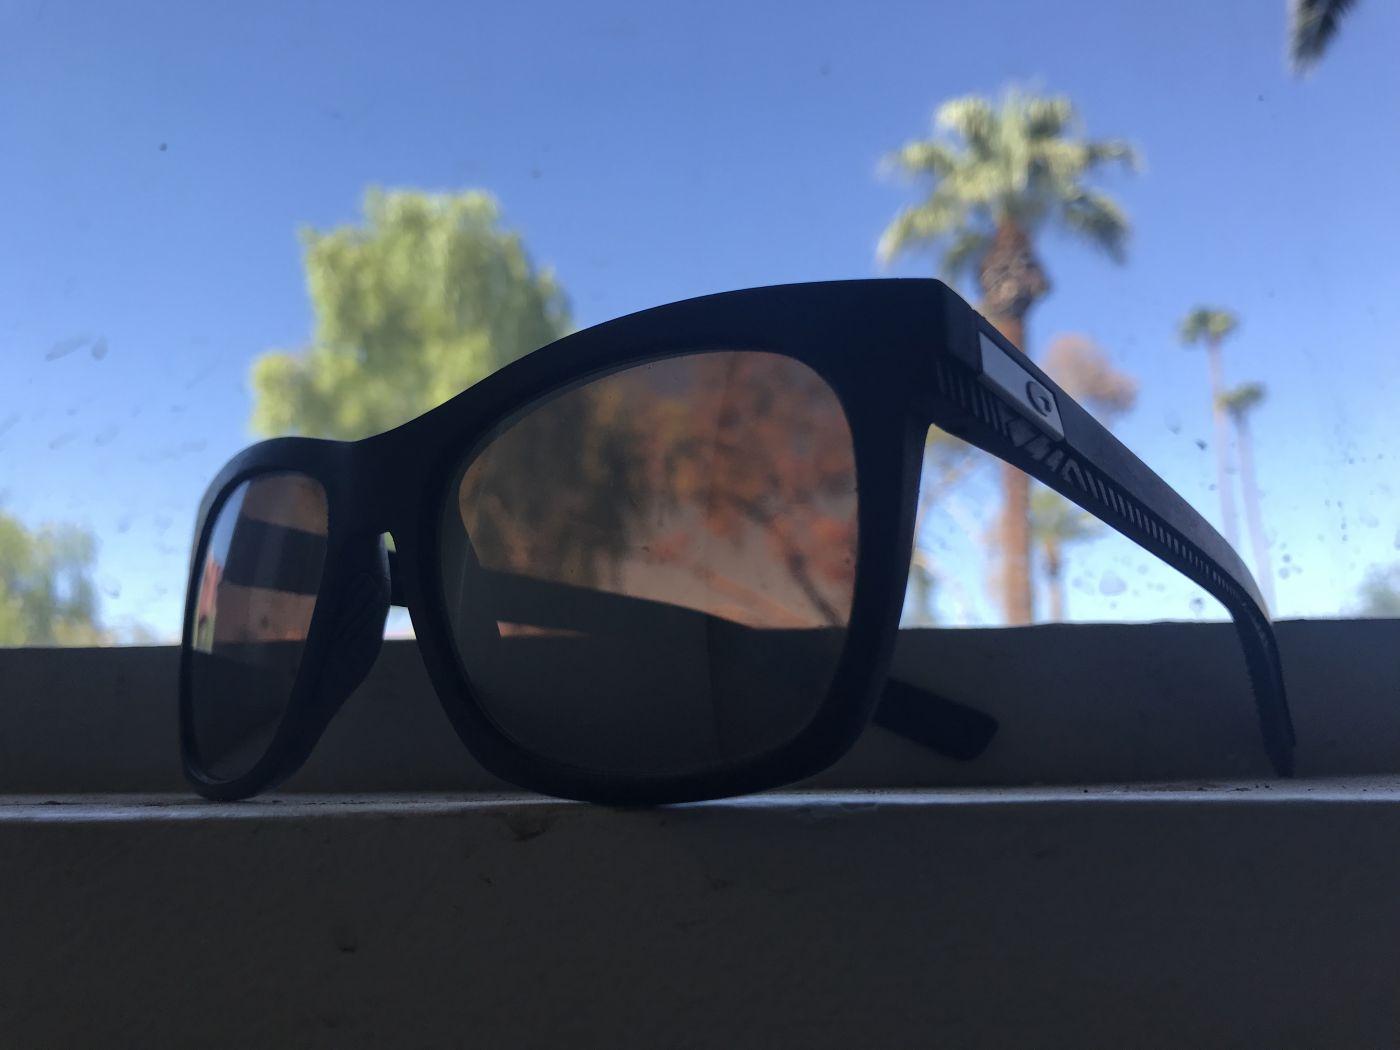 67c3e10ce2b4 Costa Caldera Sunglasses: The Untangled Collection - FeedTheHabit.com